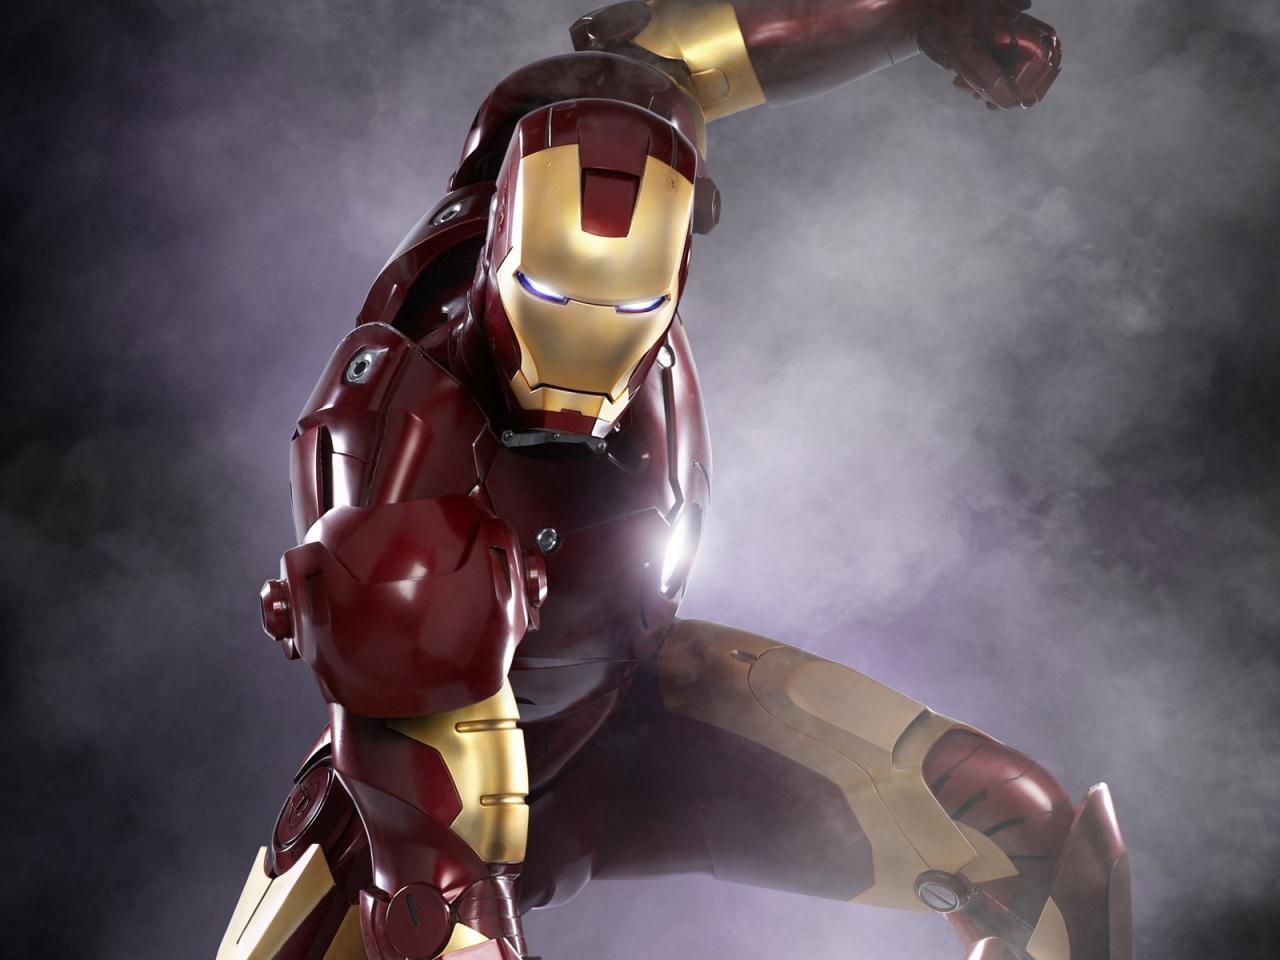 Iron man 3 awin language - Iron man 1 images ...